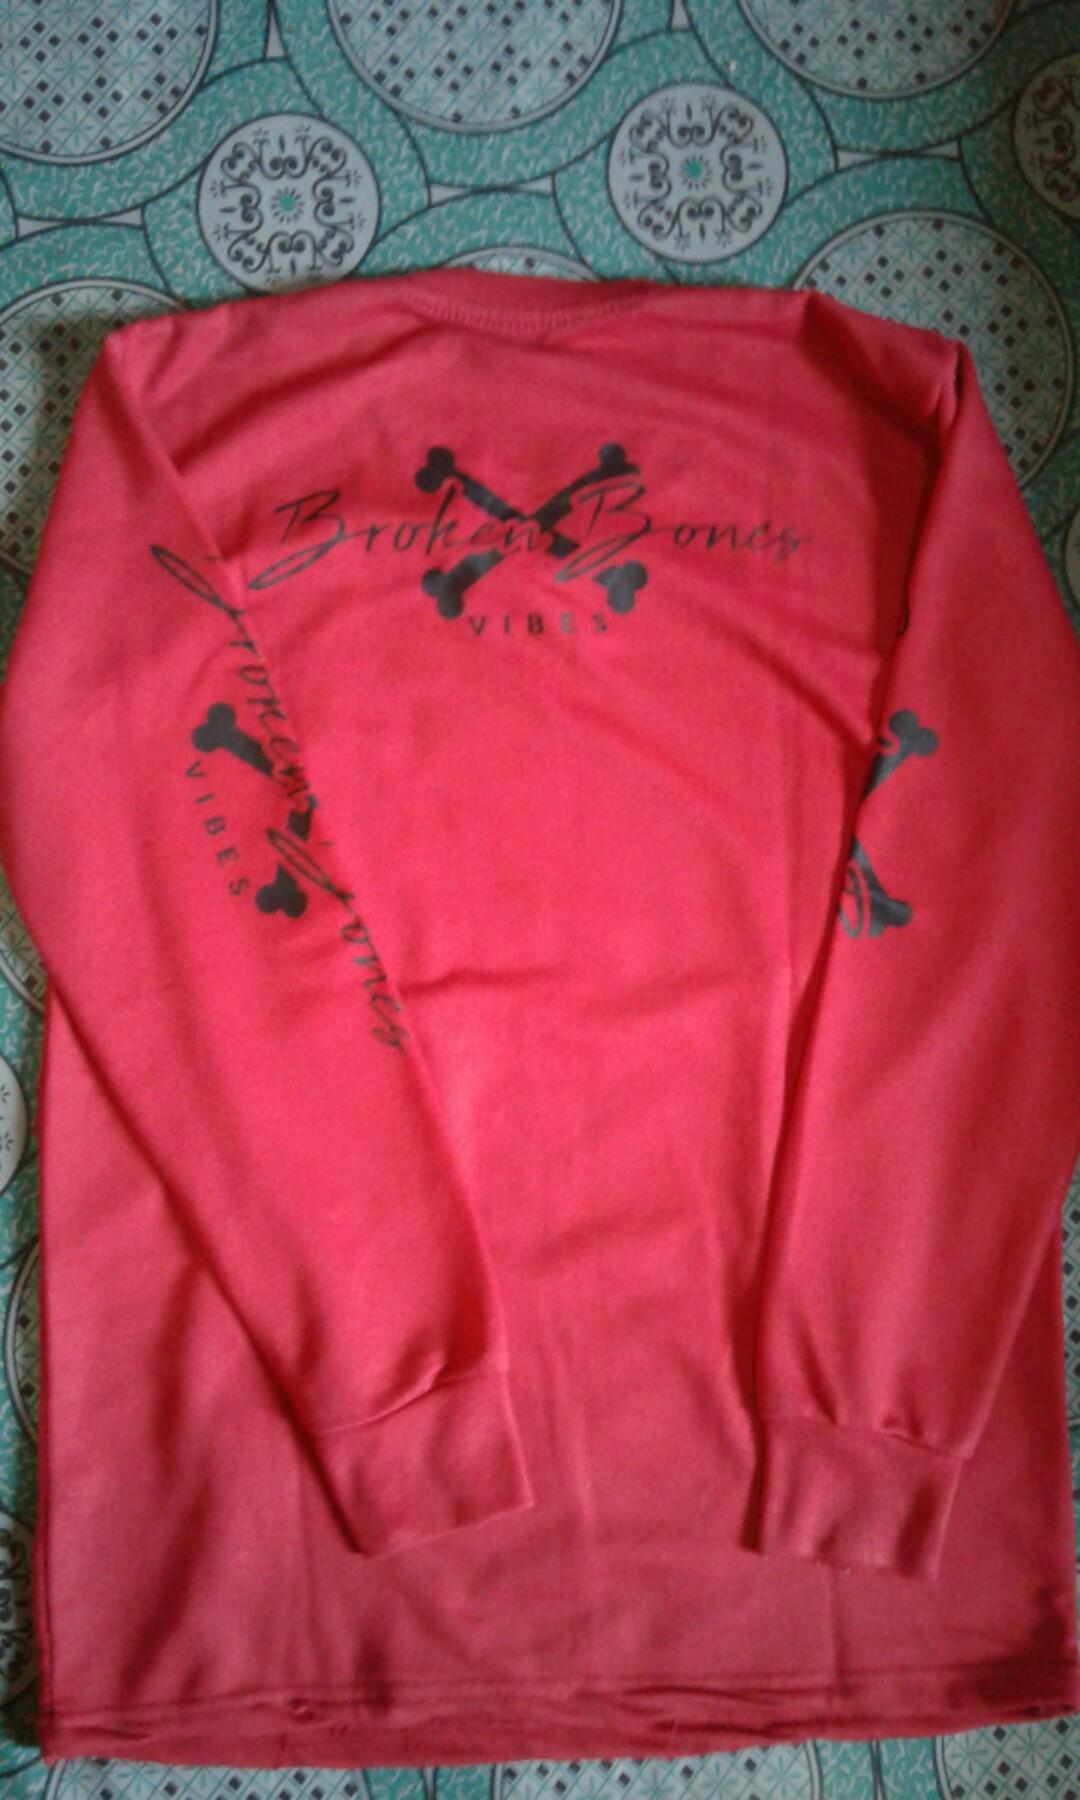 Broken Bones Red Clothes